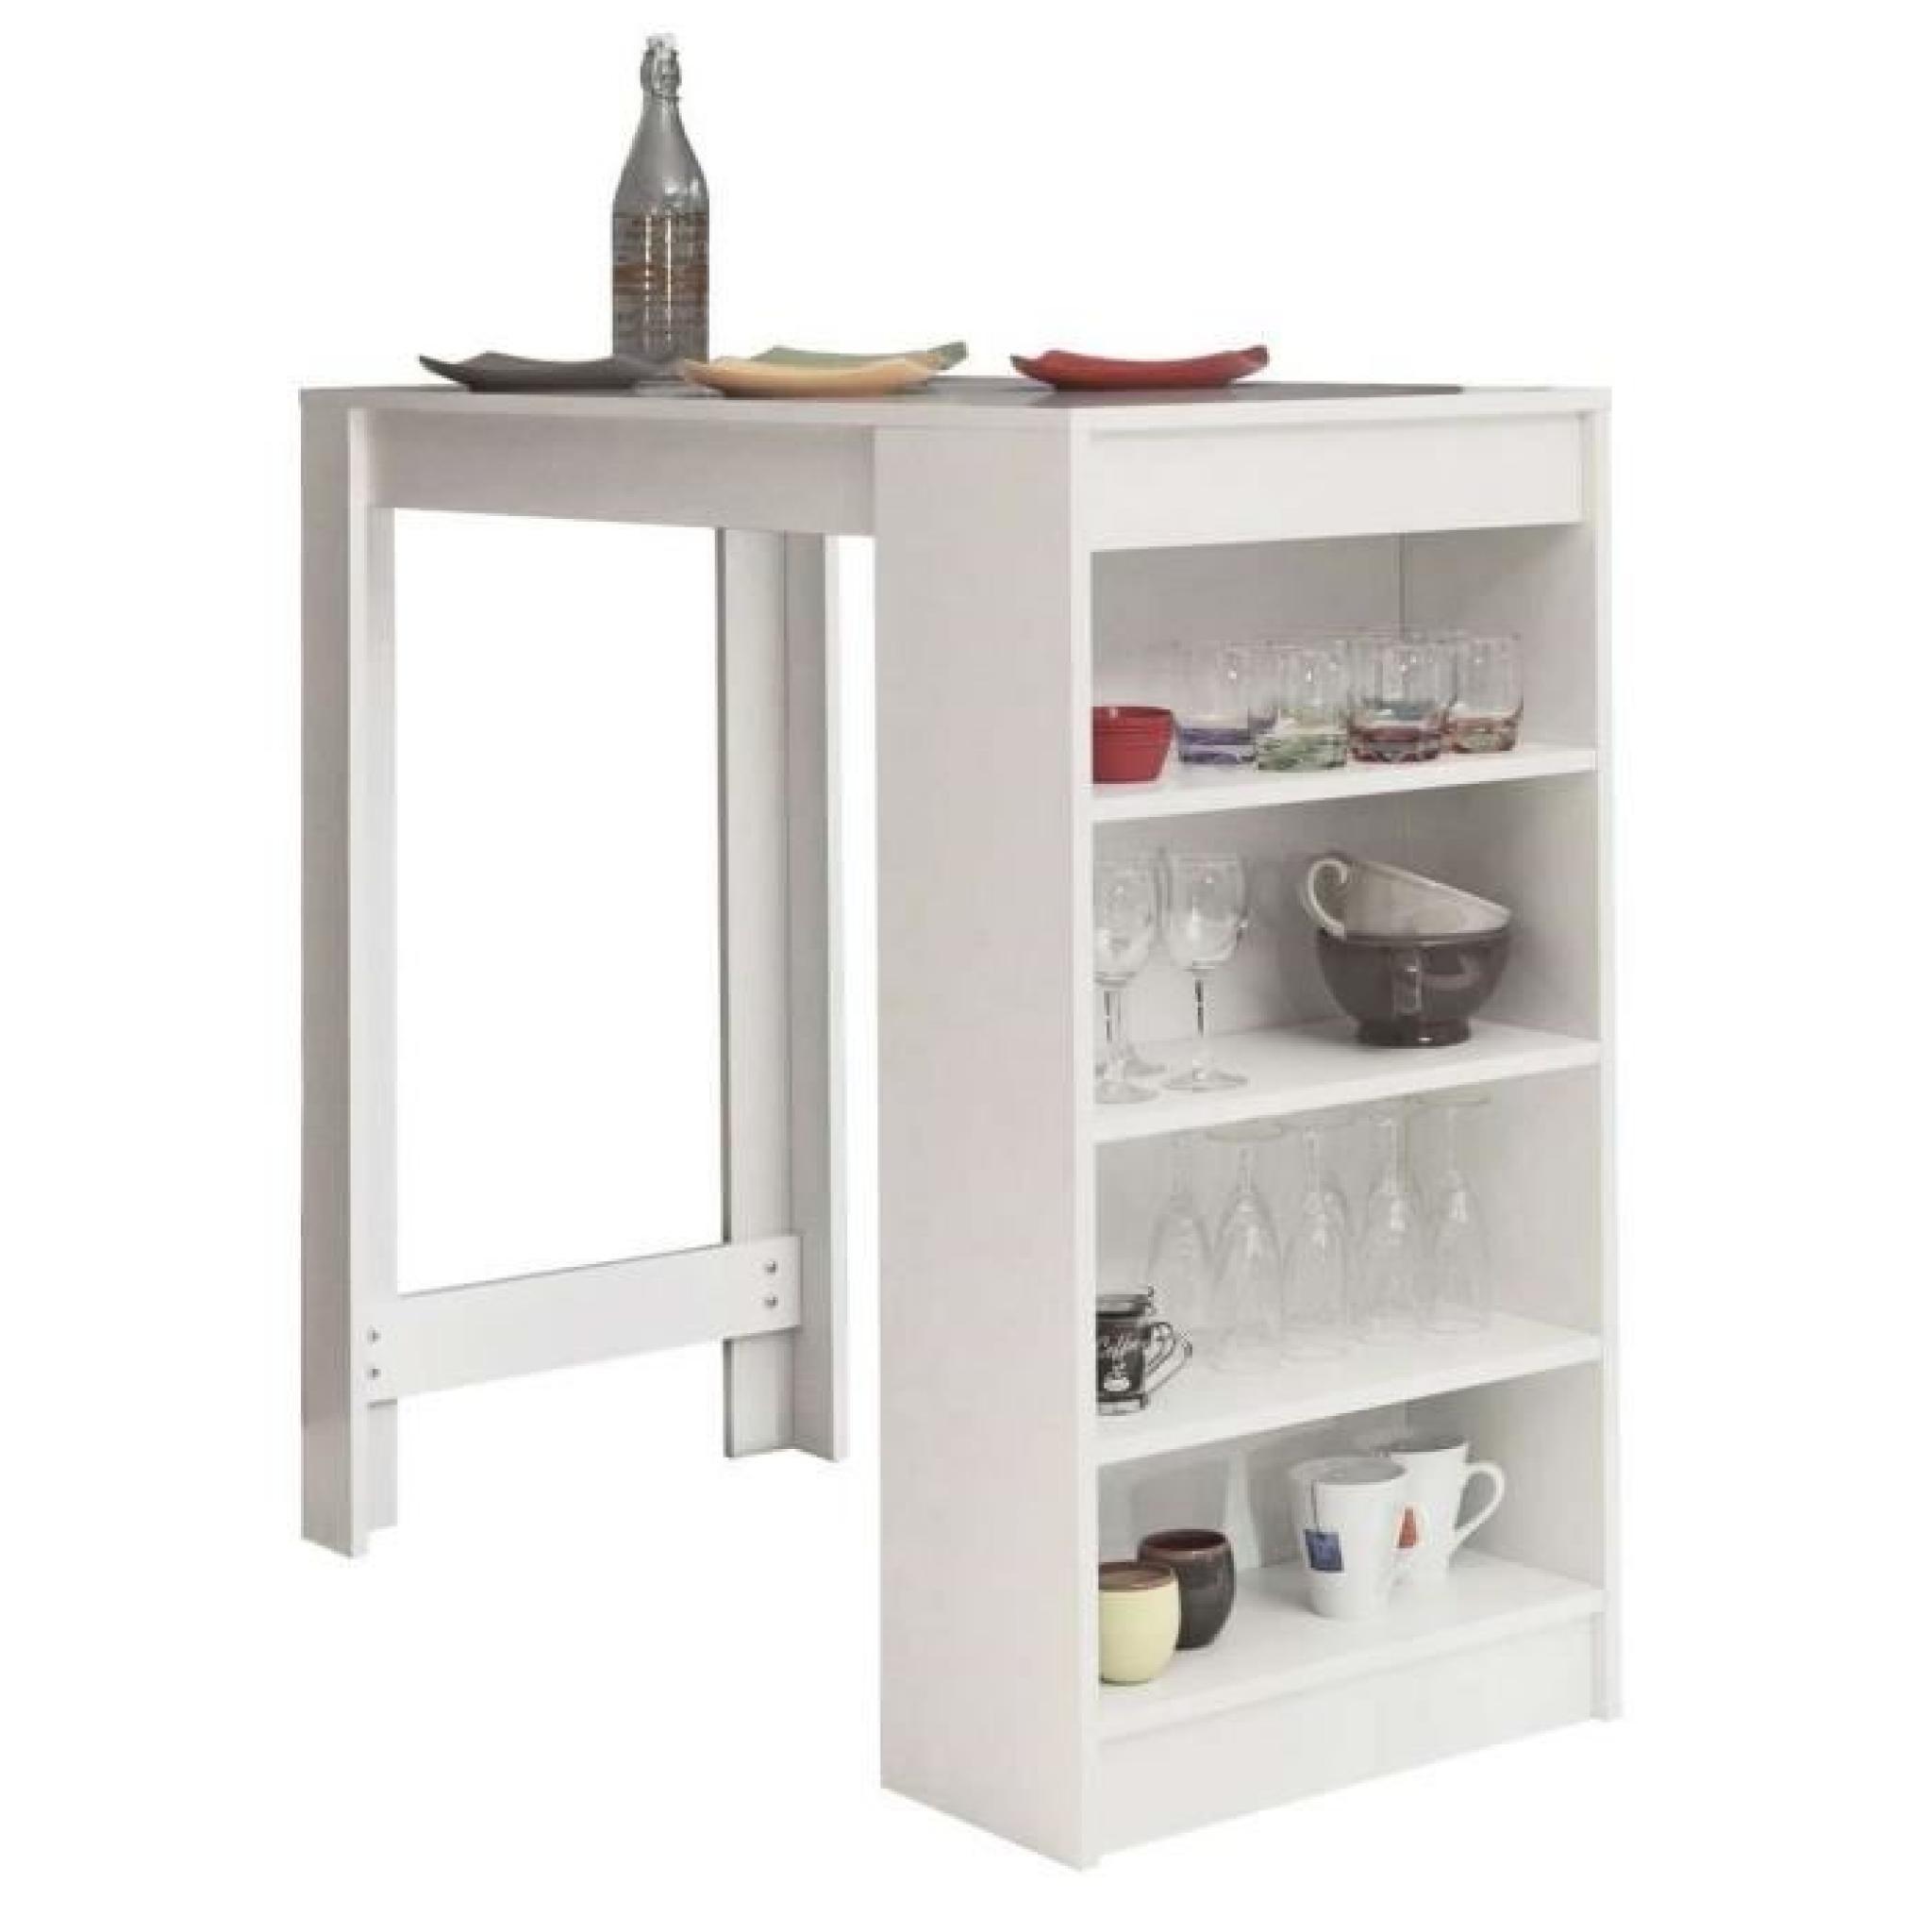 chili table bar avec rangements lat raux blanc achat vente table salle a manger pas cher. Black Bedroom Furniture Sets. Home Design Ideas